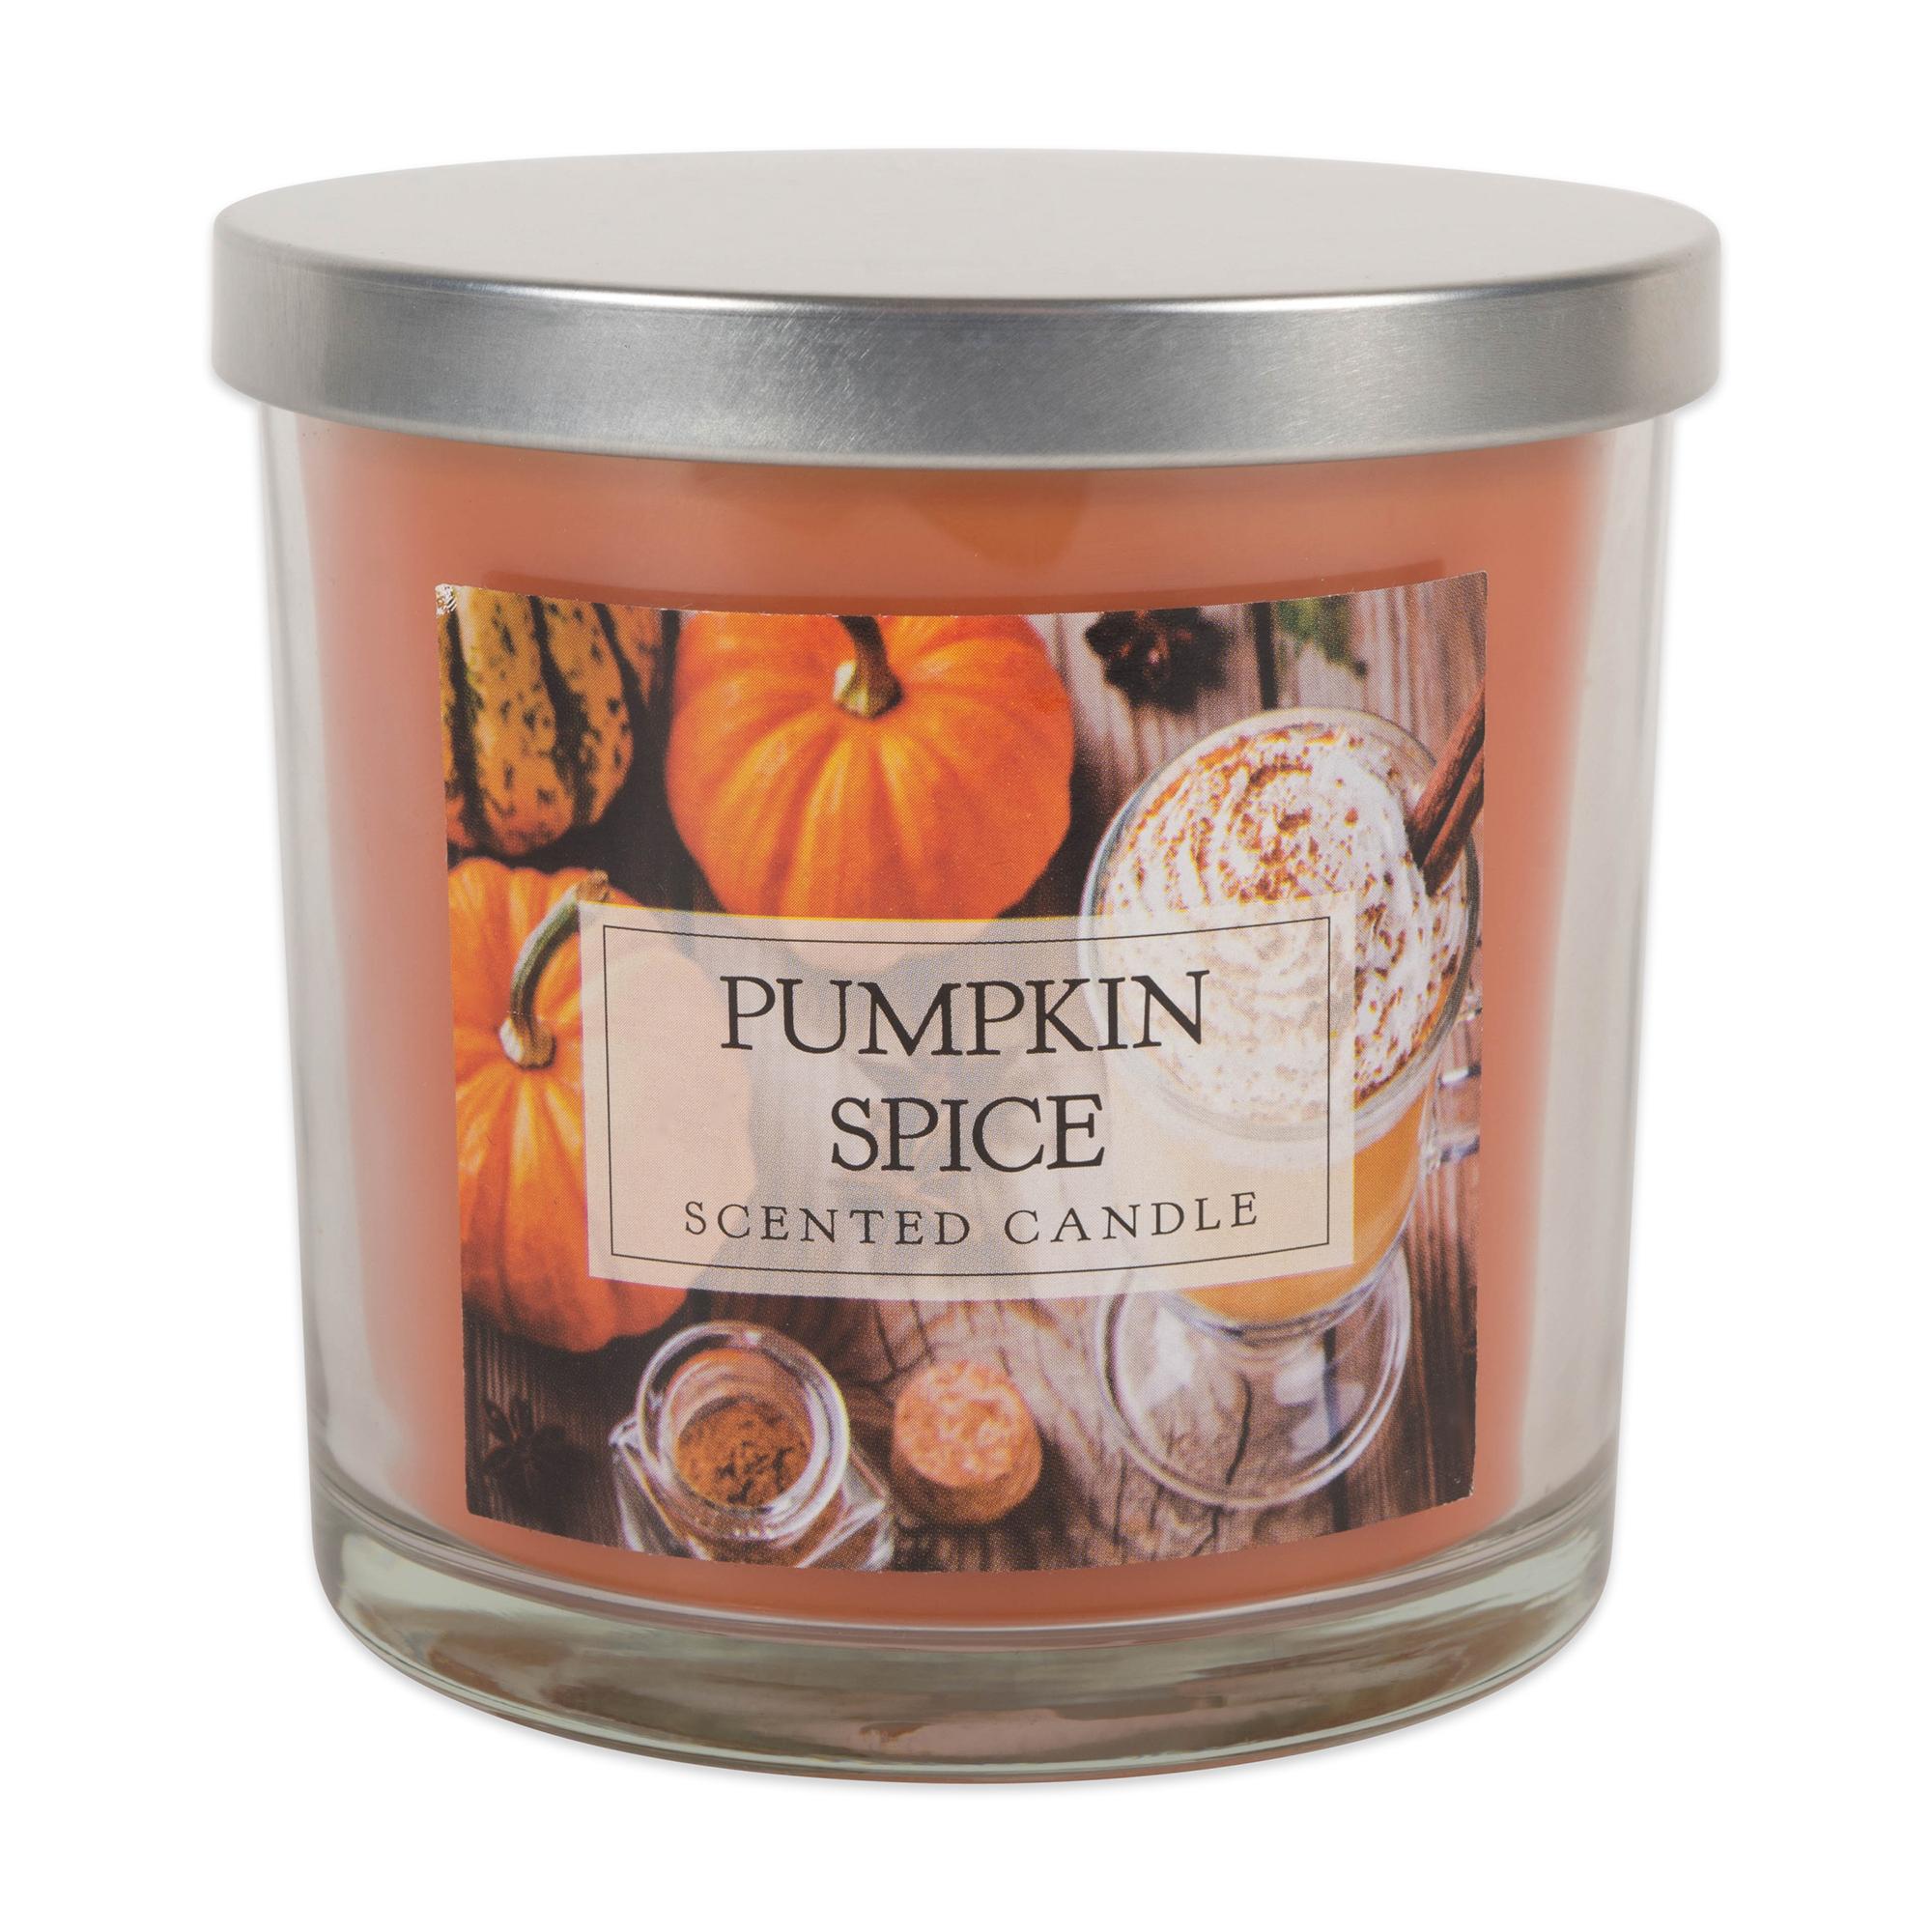 Pumpkin Spice 3 Wick Candle